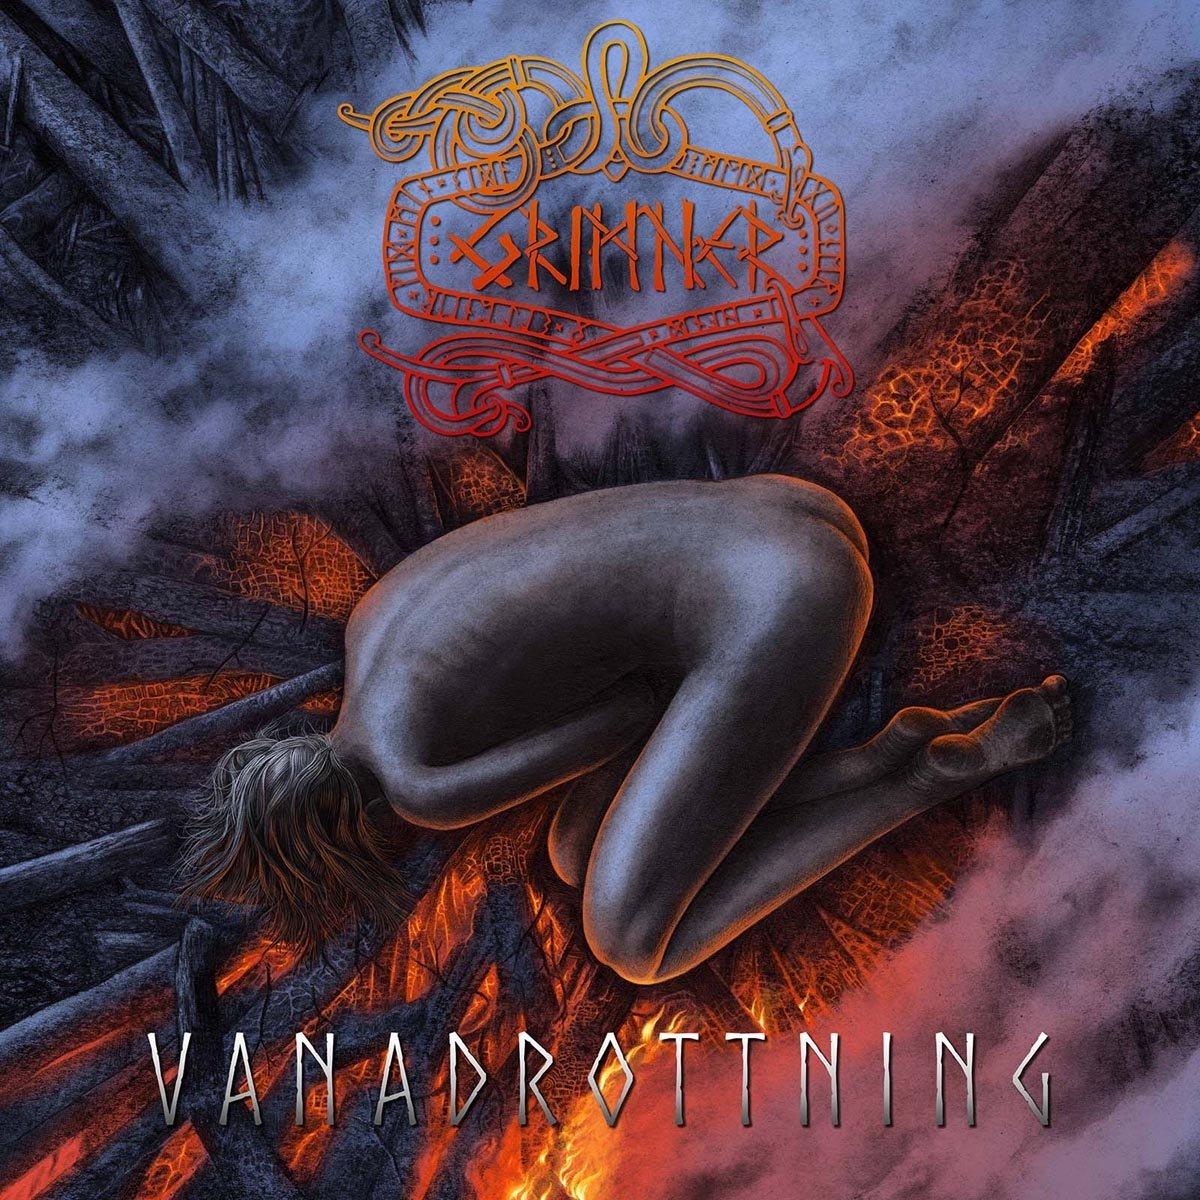 Vinilo : Grimner - Vanadrottning (LP Vinyl)